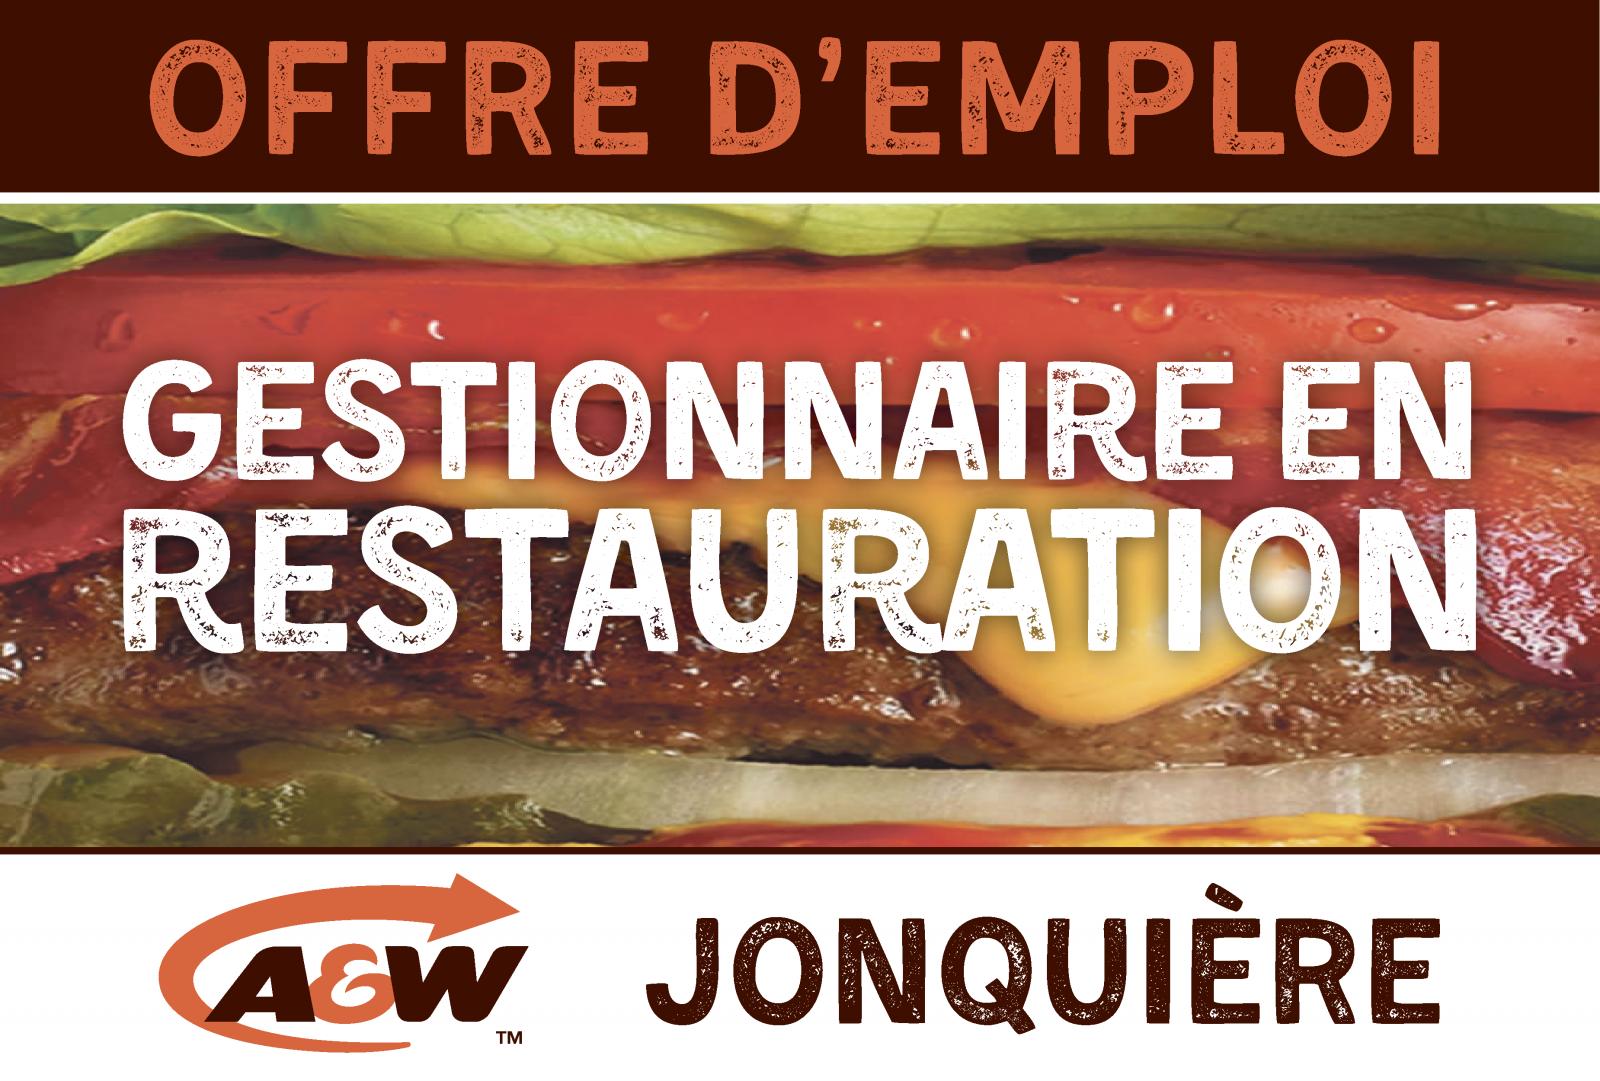 A&W Jonquière recherche un gestionnaire en restauration